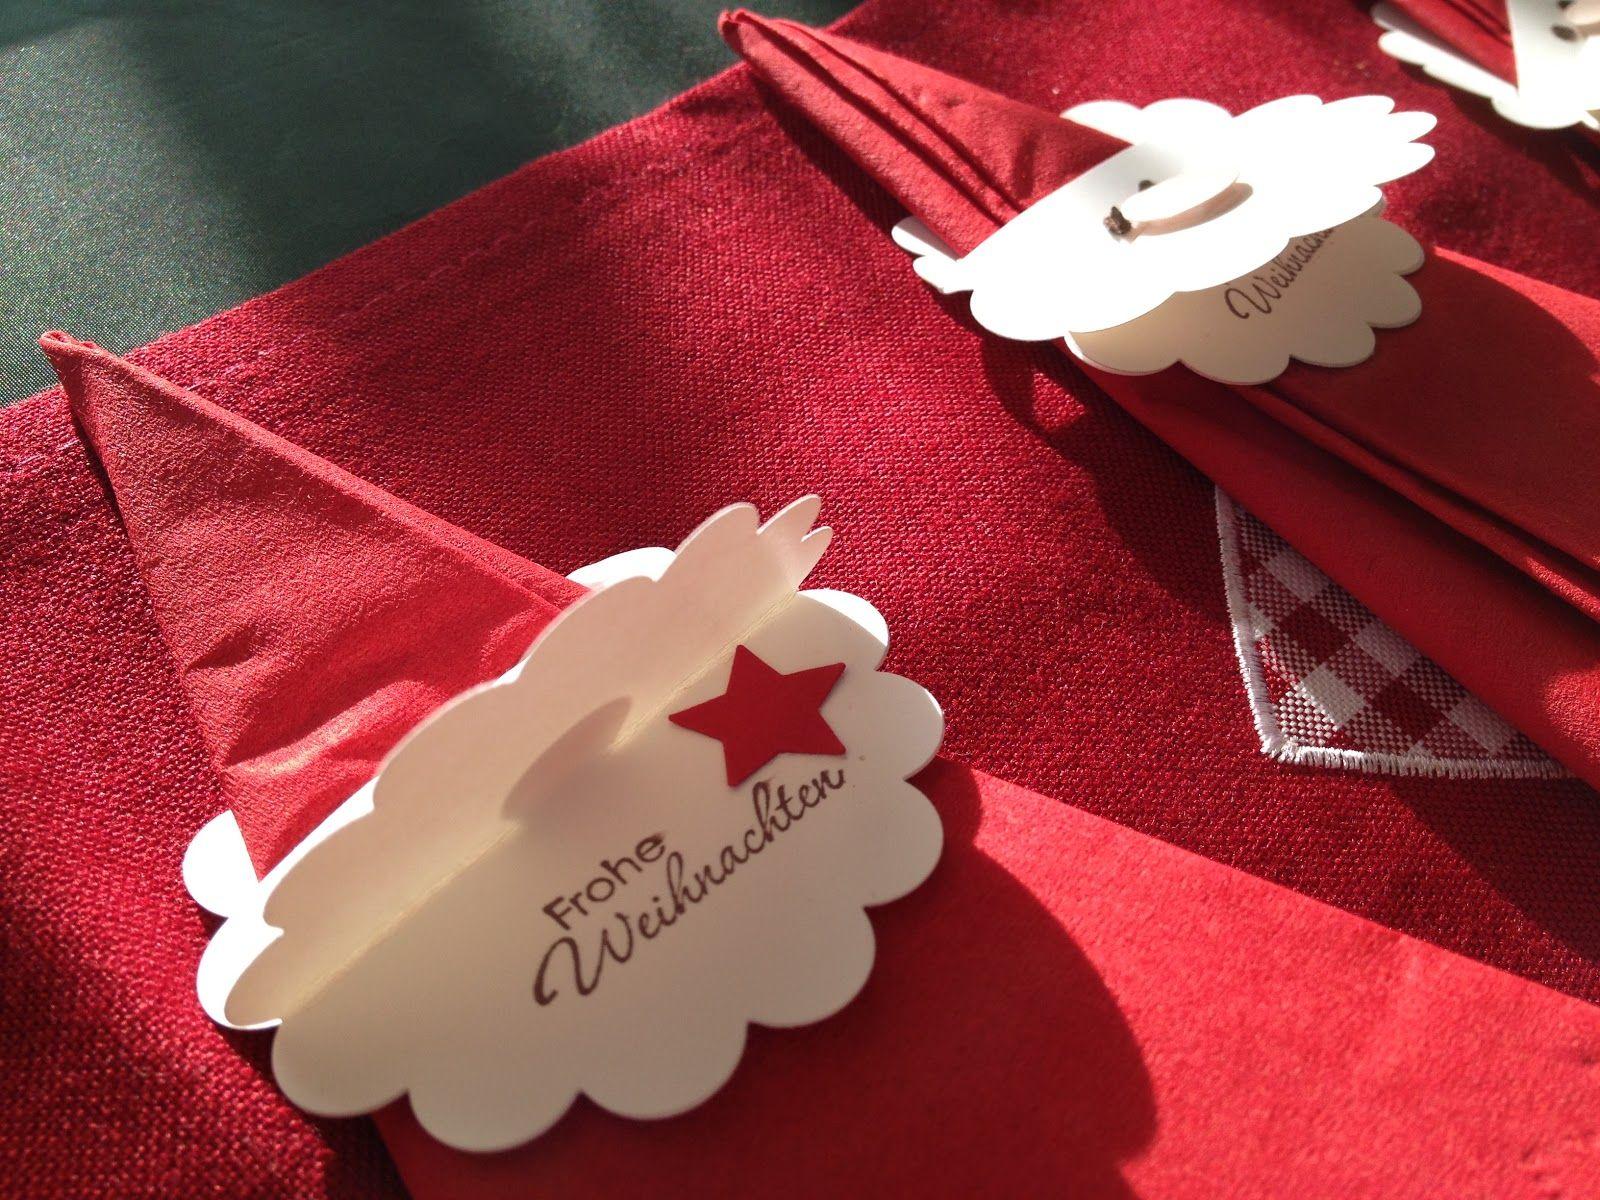 Bely 39 s kreative stempelideen decoraci n de mesa para - Mesas decoradas para navidad ...